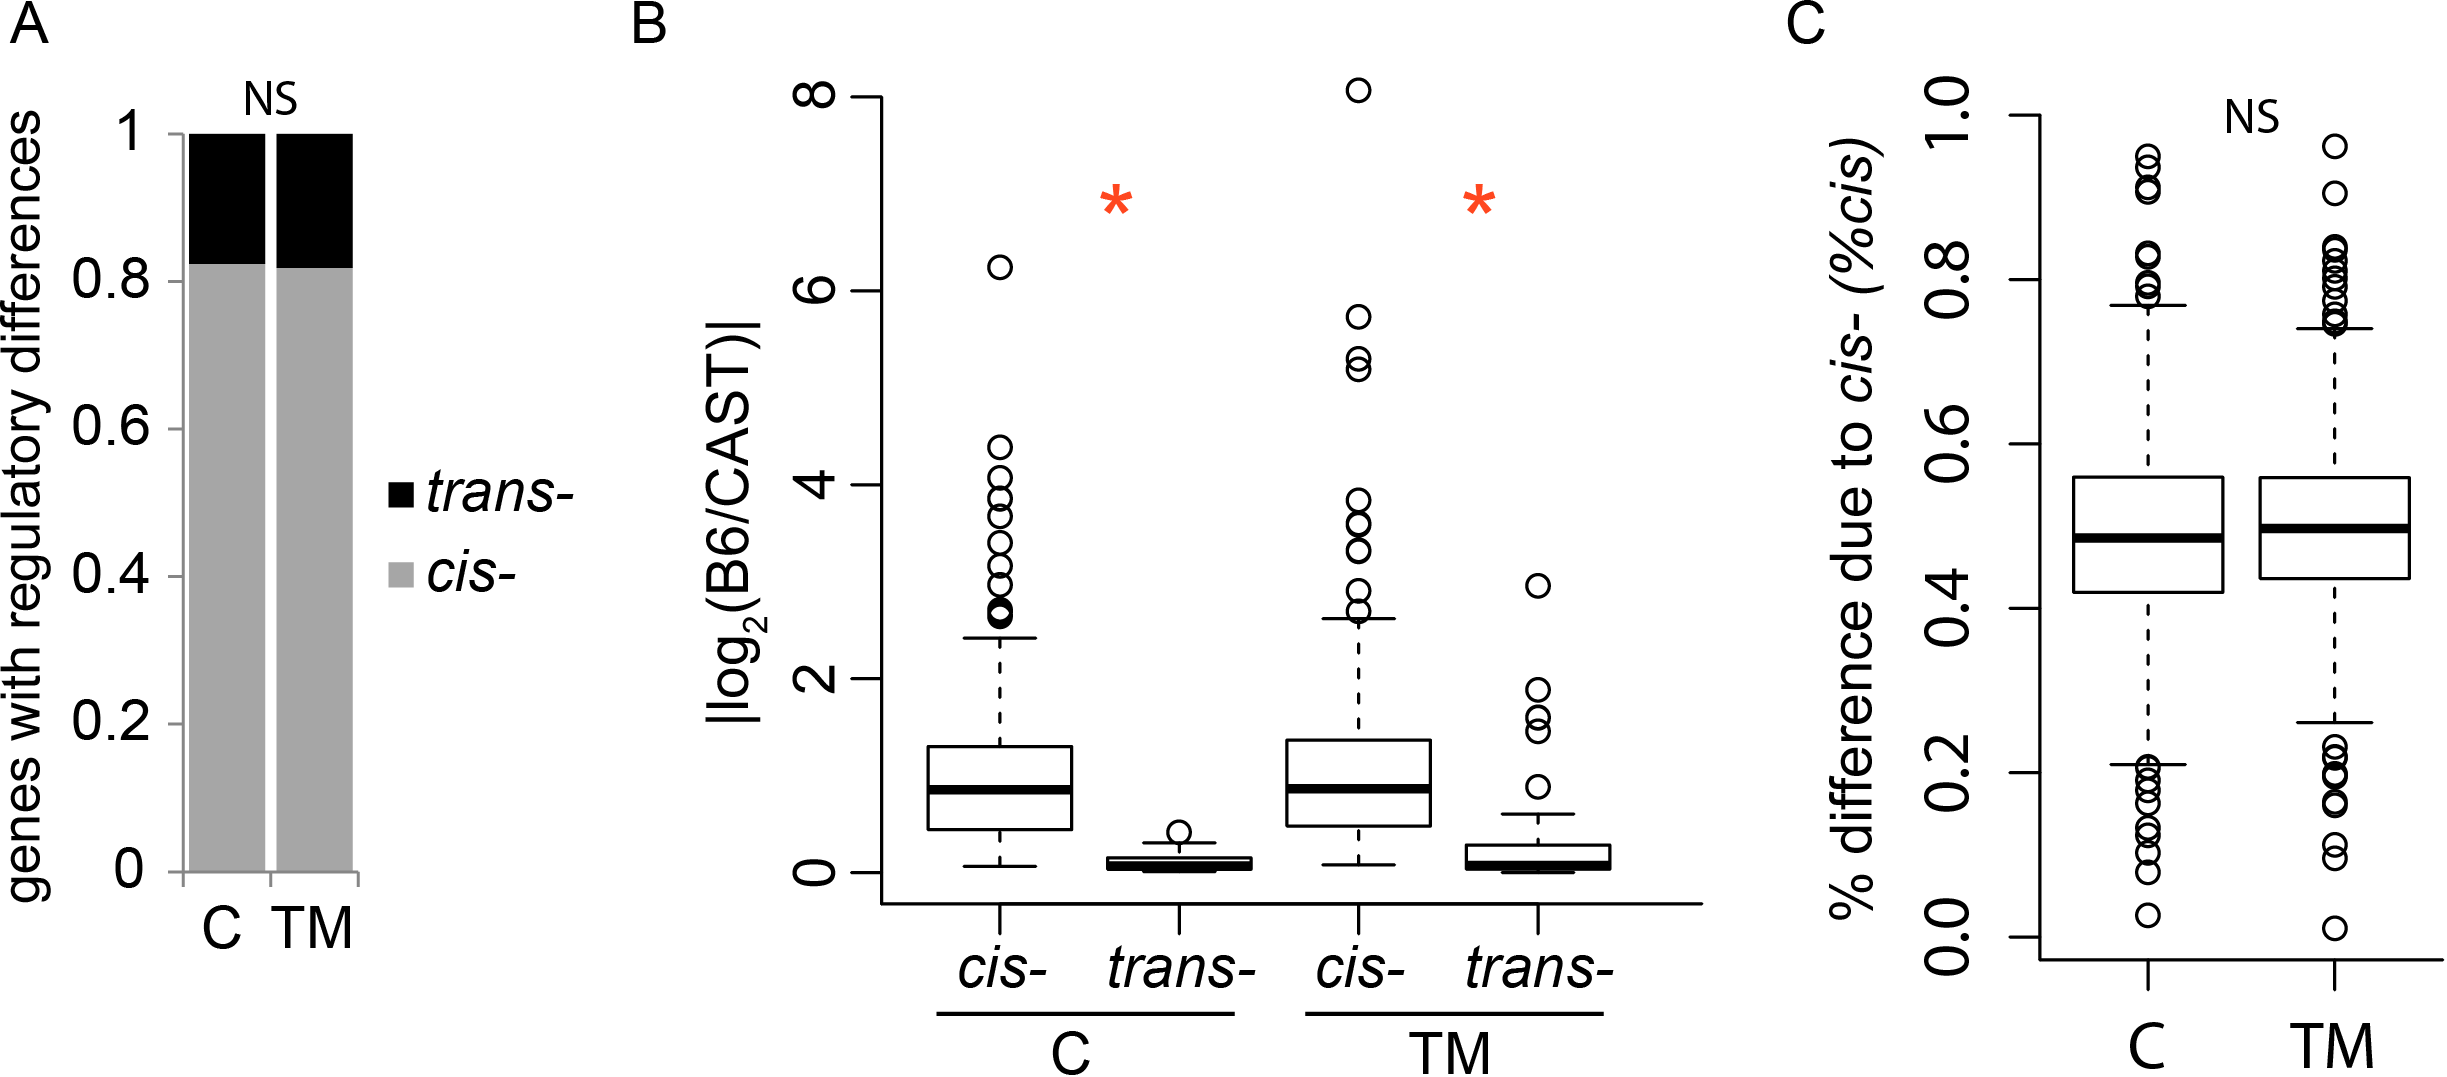 ER stress does not alter the regulatory landscape between B6 and CAST.